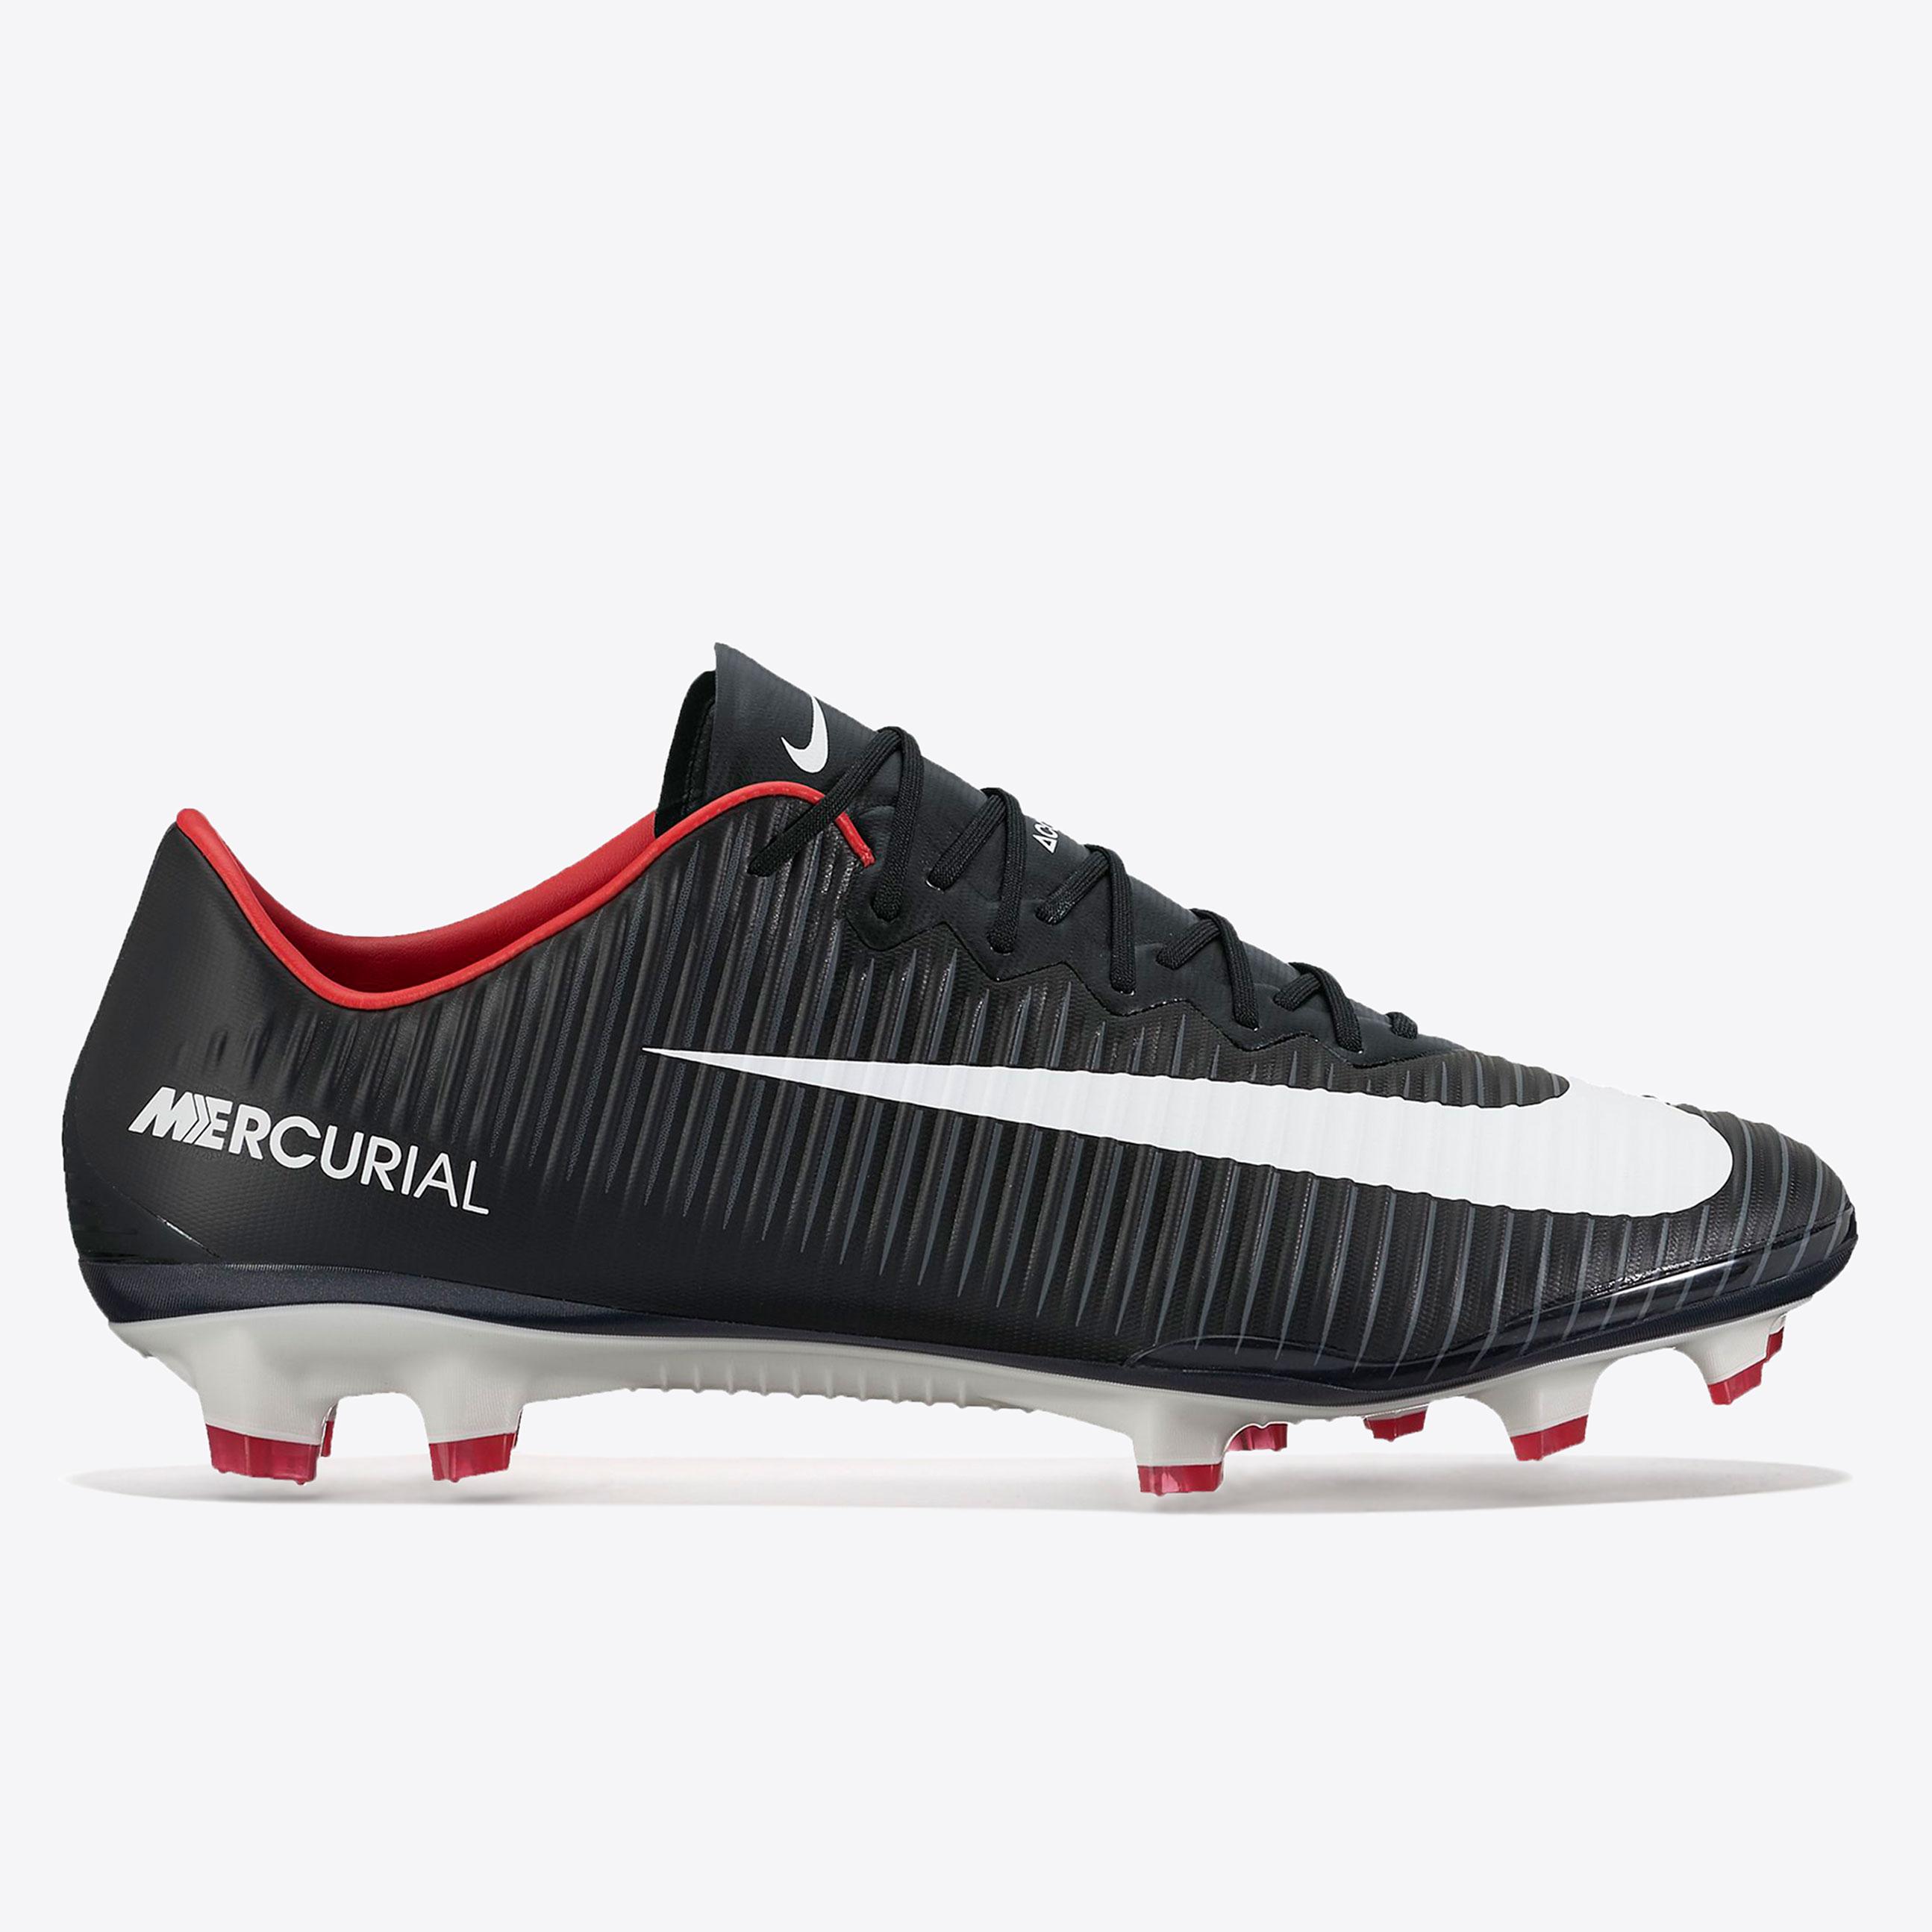 Nike Mercurial Vapor XI Firm Ground Football Boots - Black/White/Dark